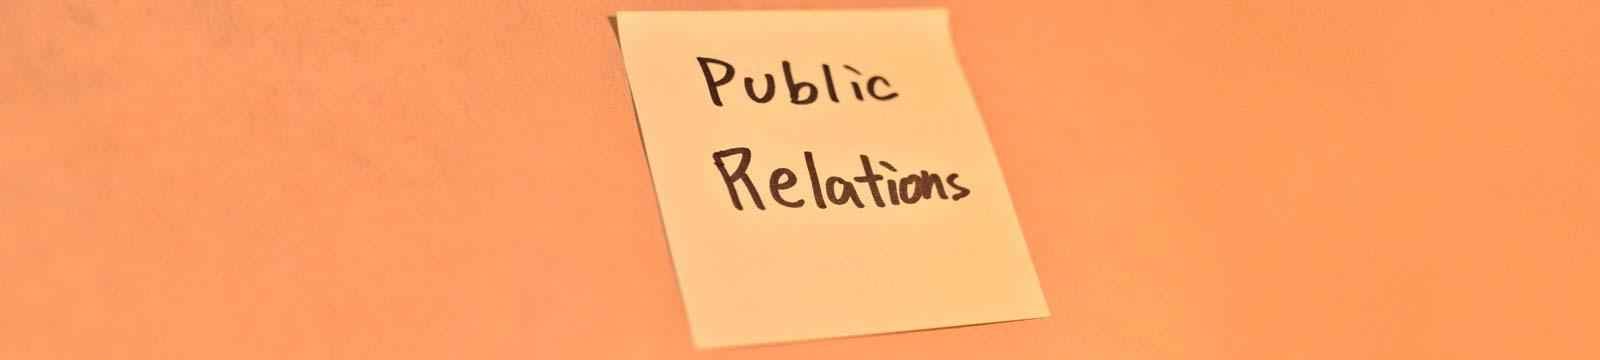 Online Public Relations